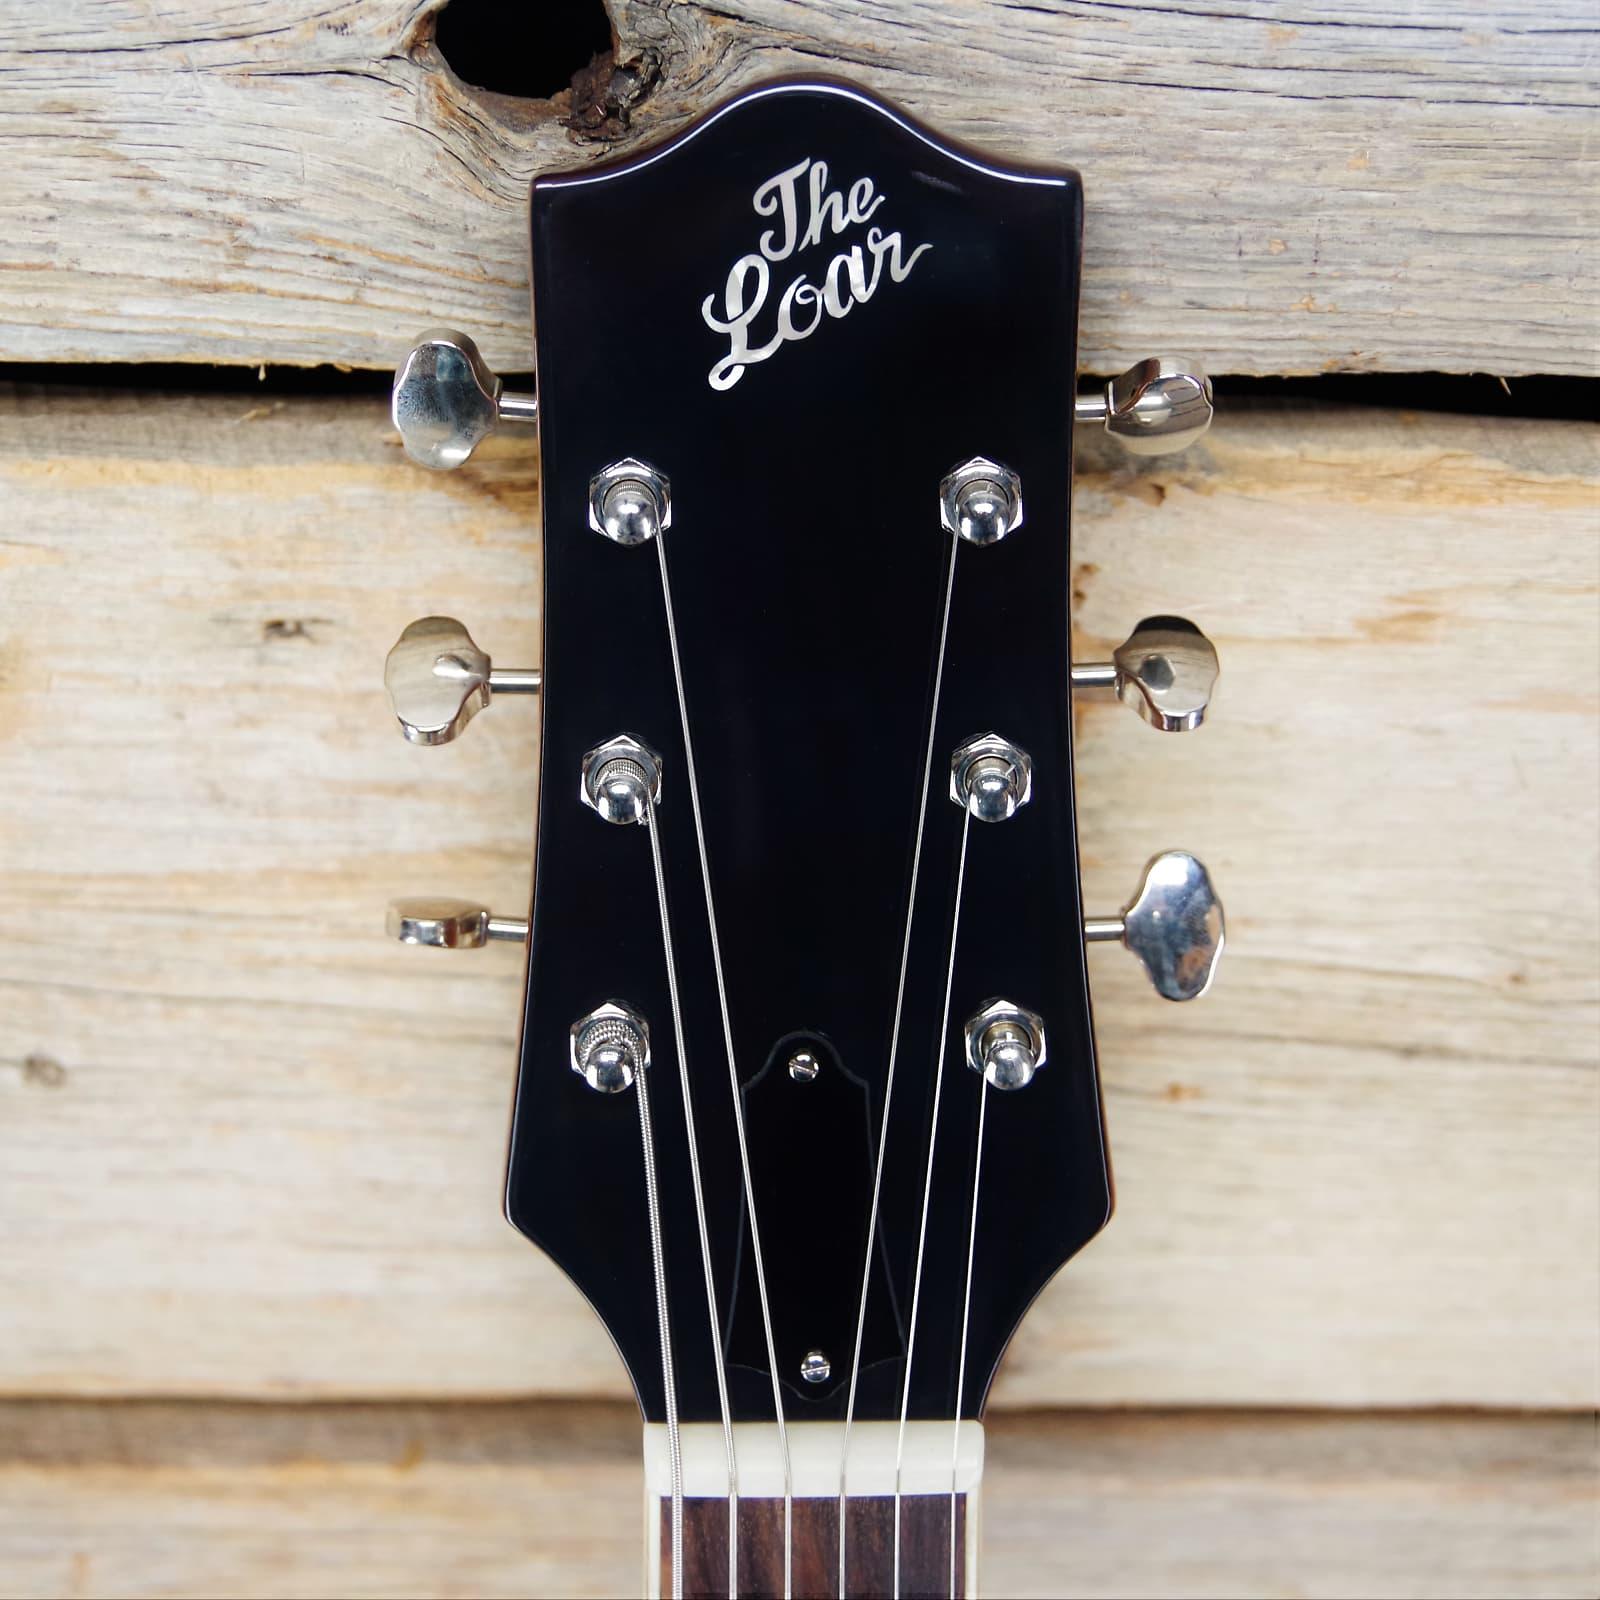 The Loar LH-280 Hollowbody Archtop Electric Guitar, Vintage Sunburst